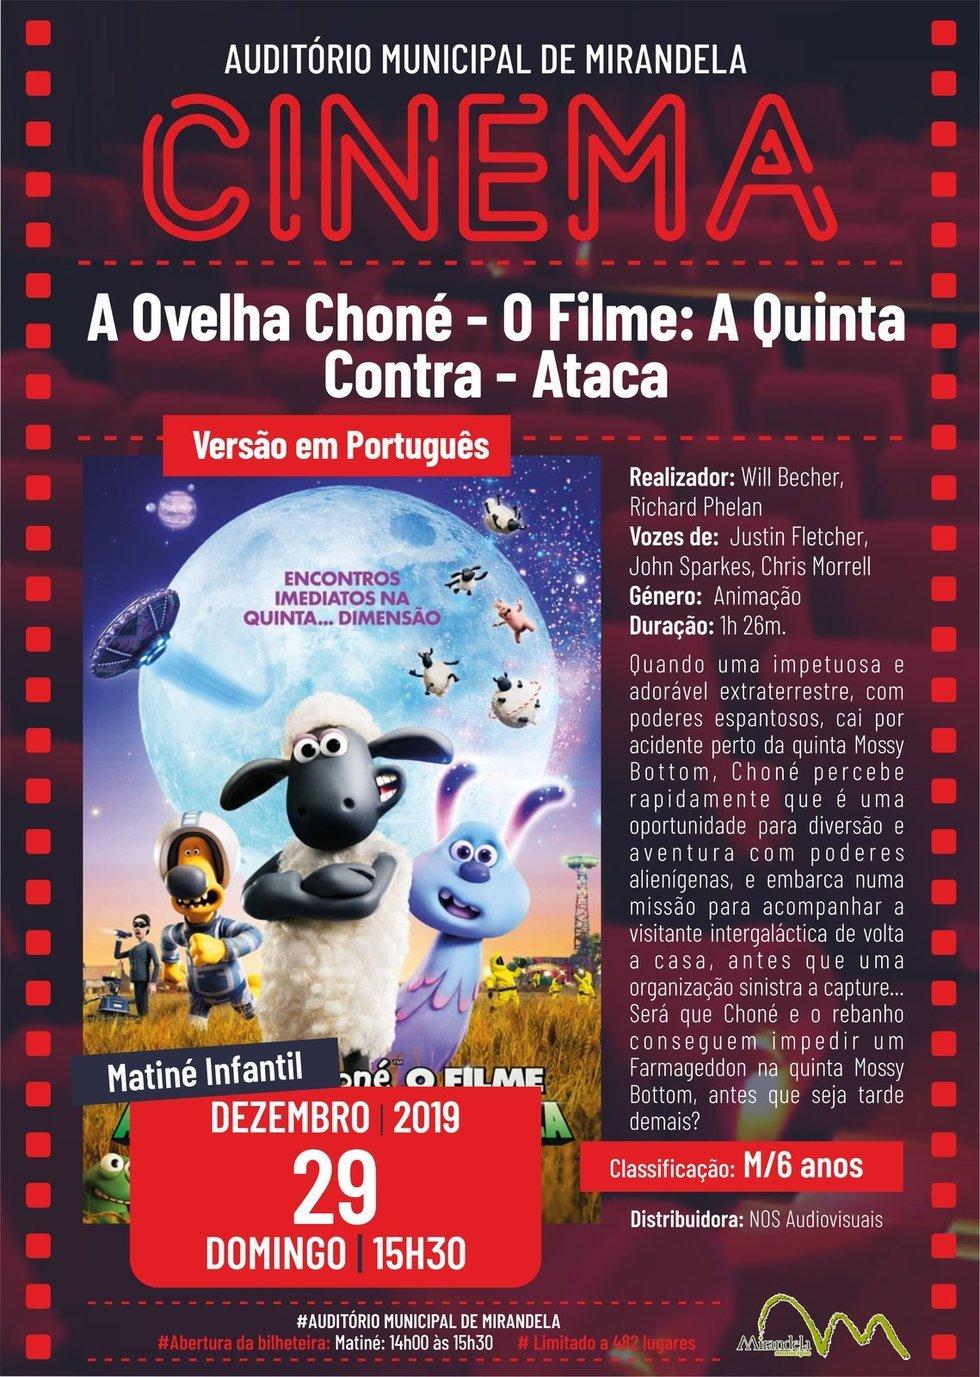 Cinema: A Ovelha Choné - O Filme